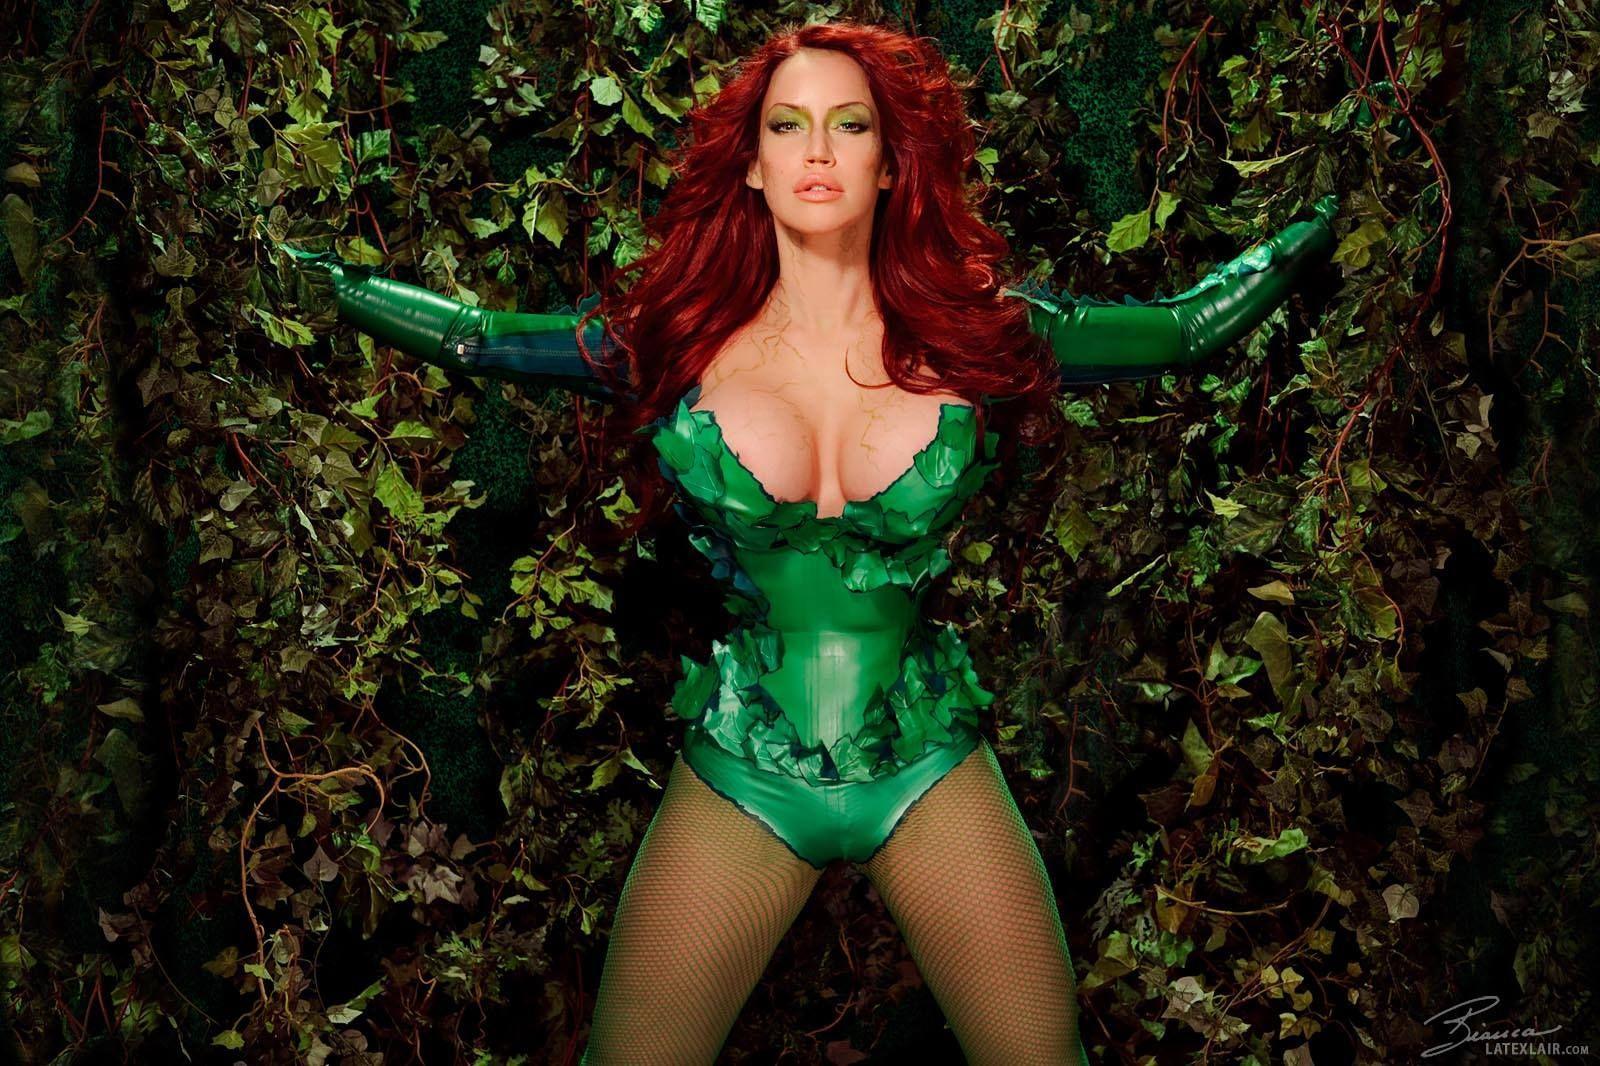 best of Pics Ivy redhead